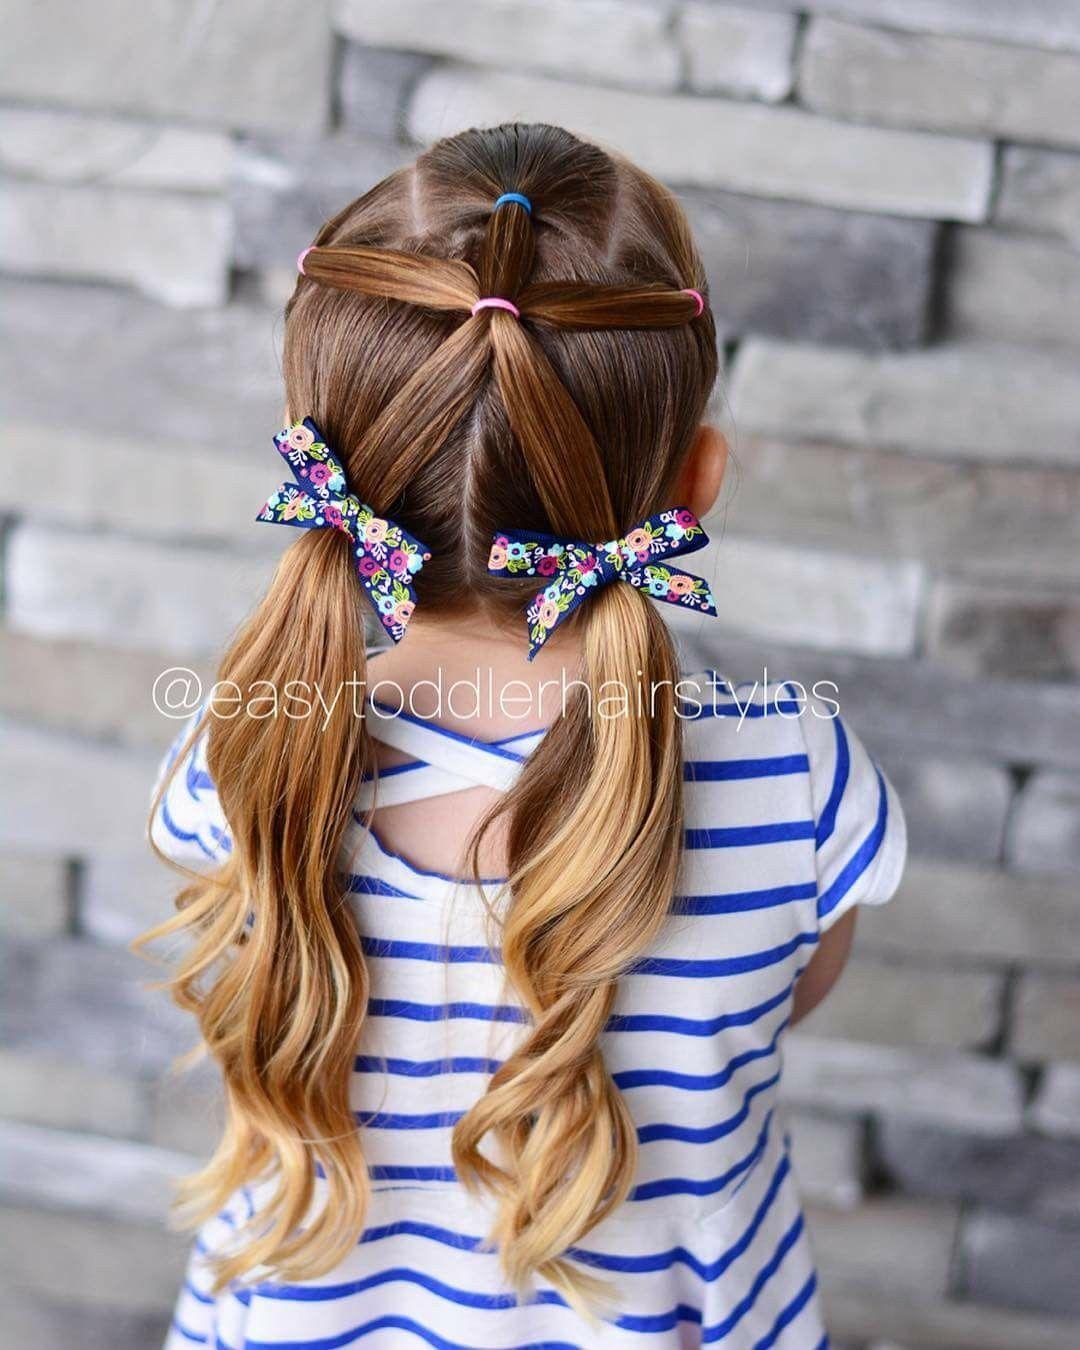 Pin by kathryn wyatt on baby girl pinterest girl hair hair